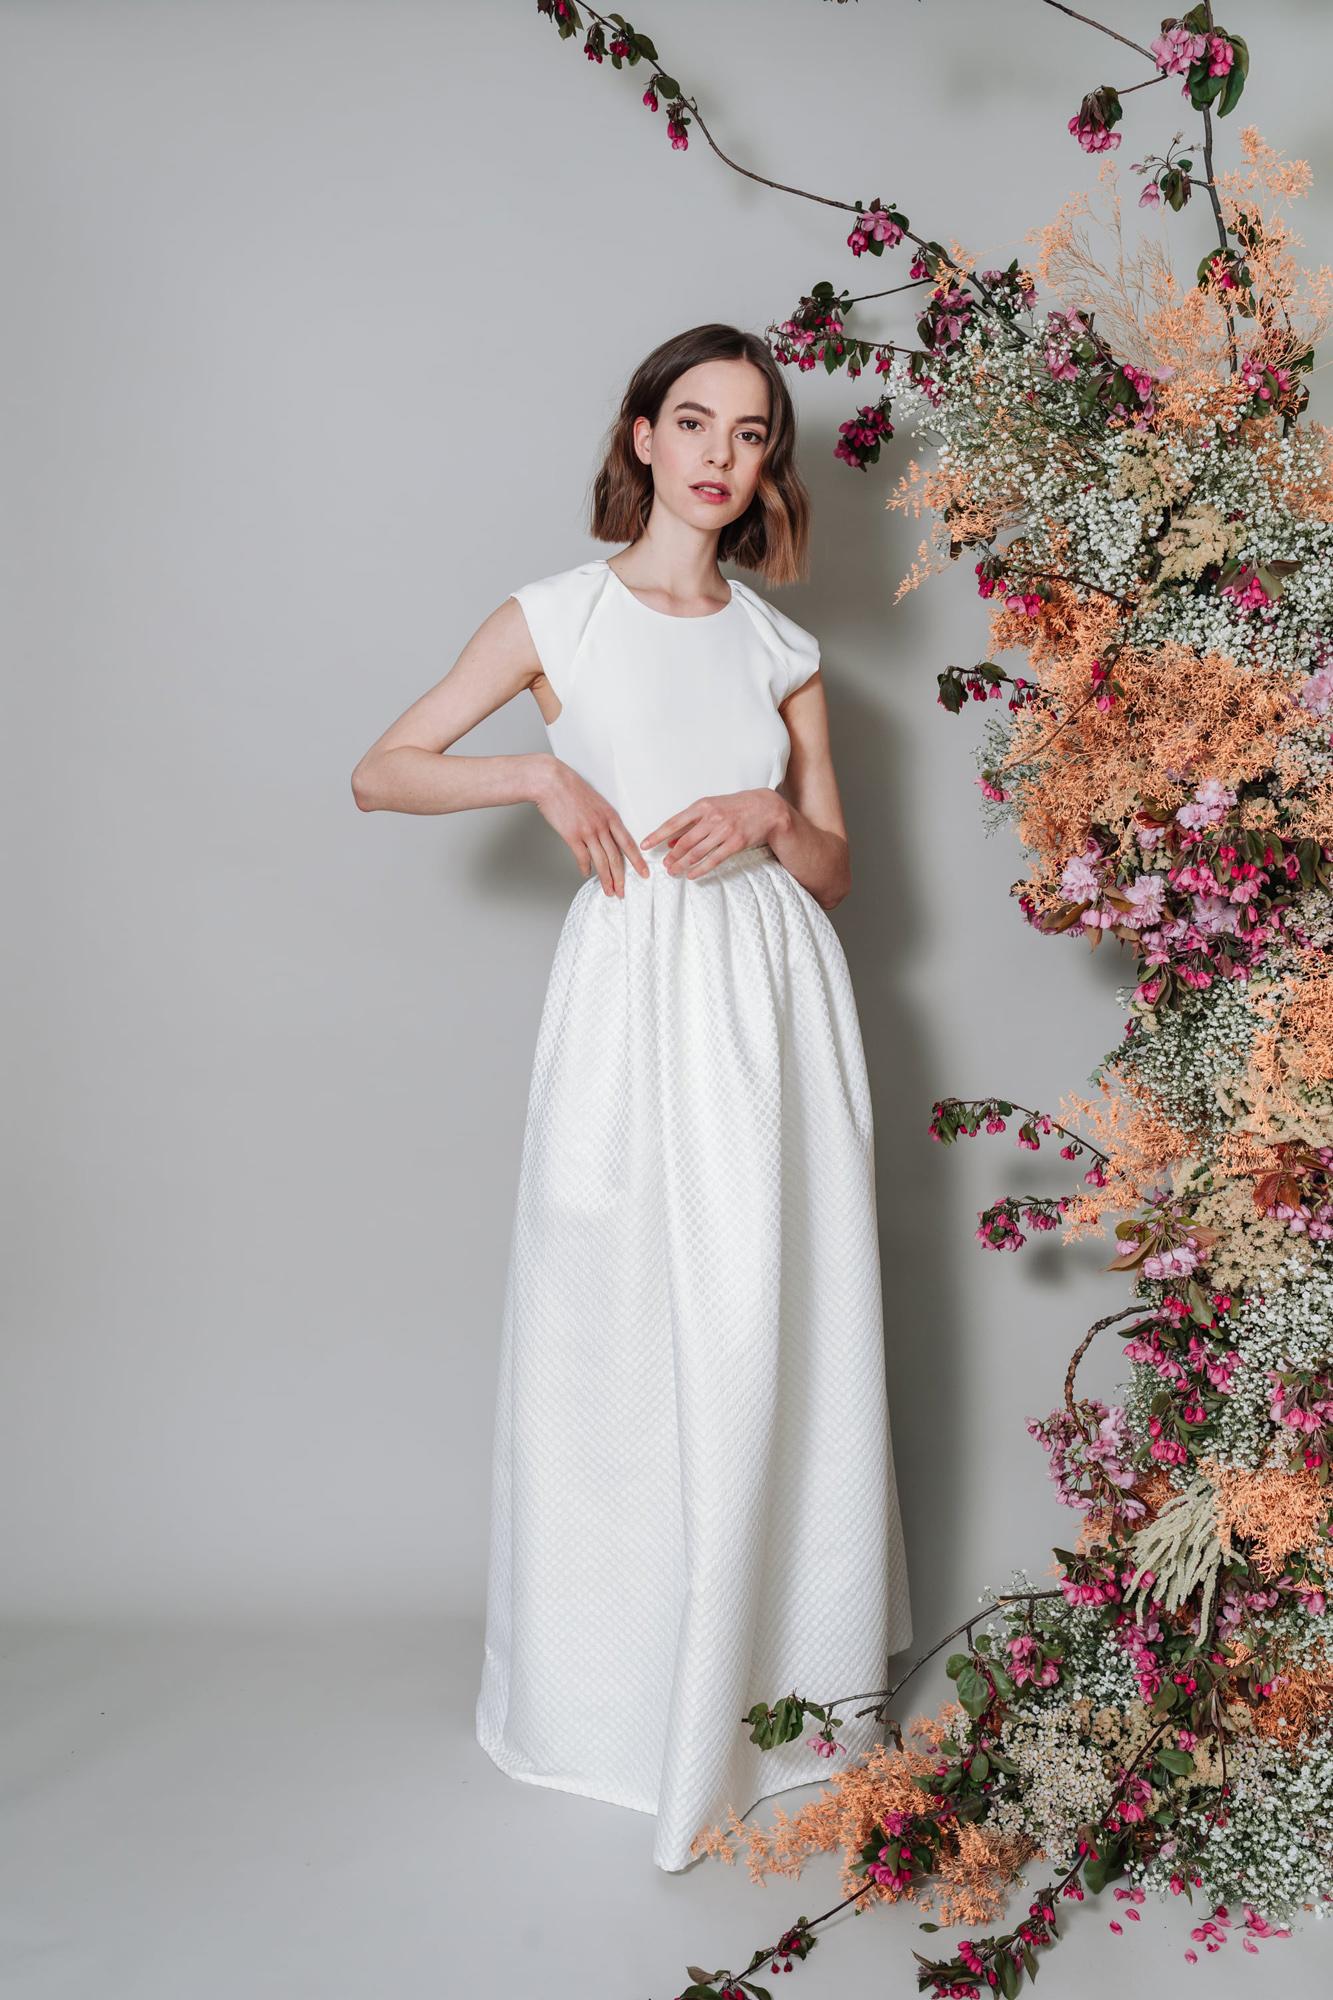 Kate-Beaumont-Sheffield-Zinnia-Modern-Wedding-Gown-Polka-Dot-Pleated-Skirt-6.jpg